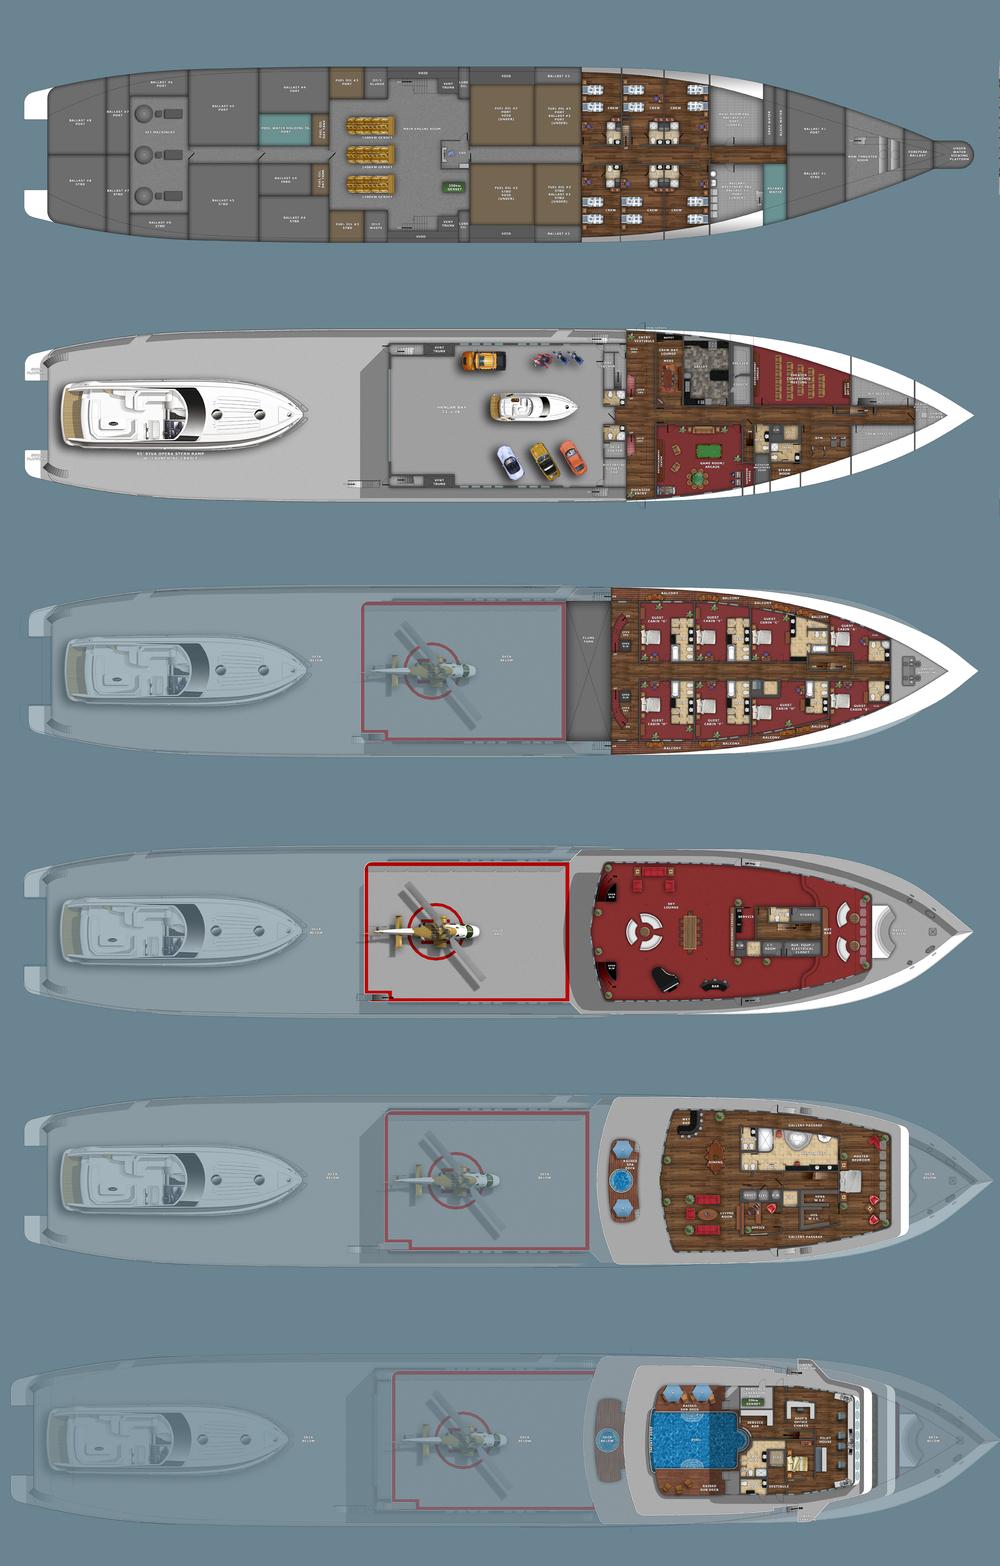 floorplan-boat02.jpg